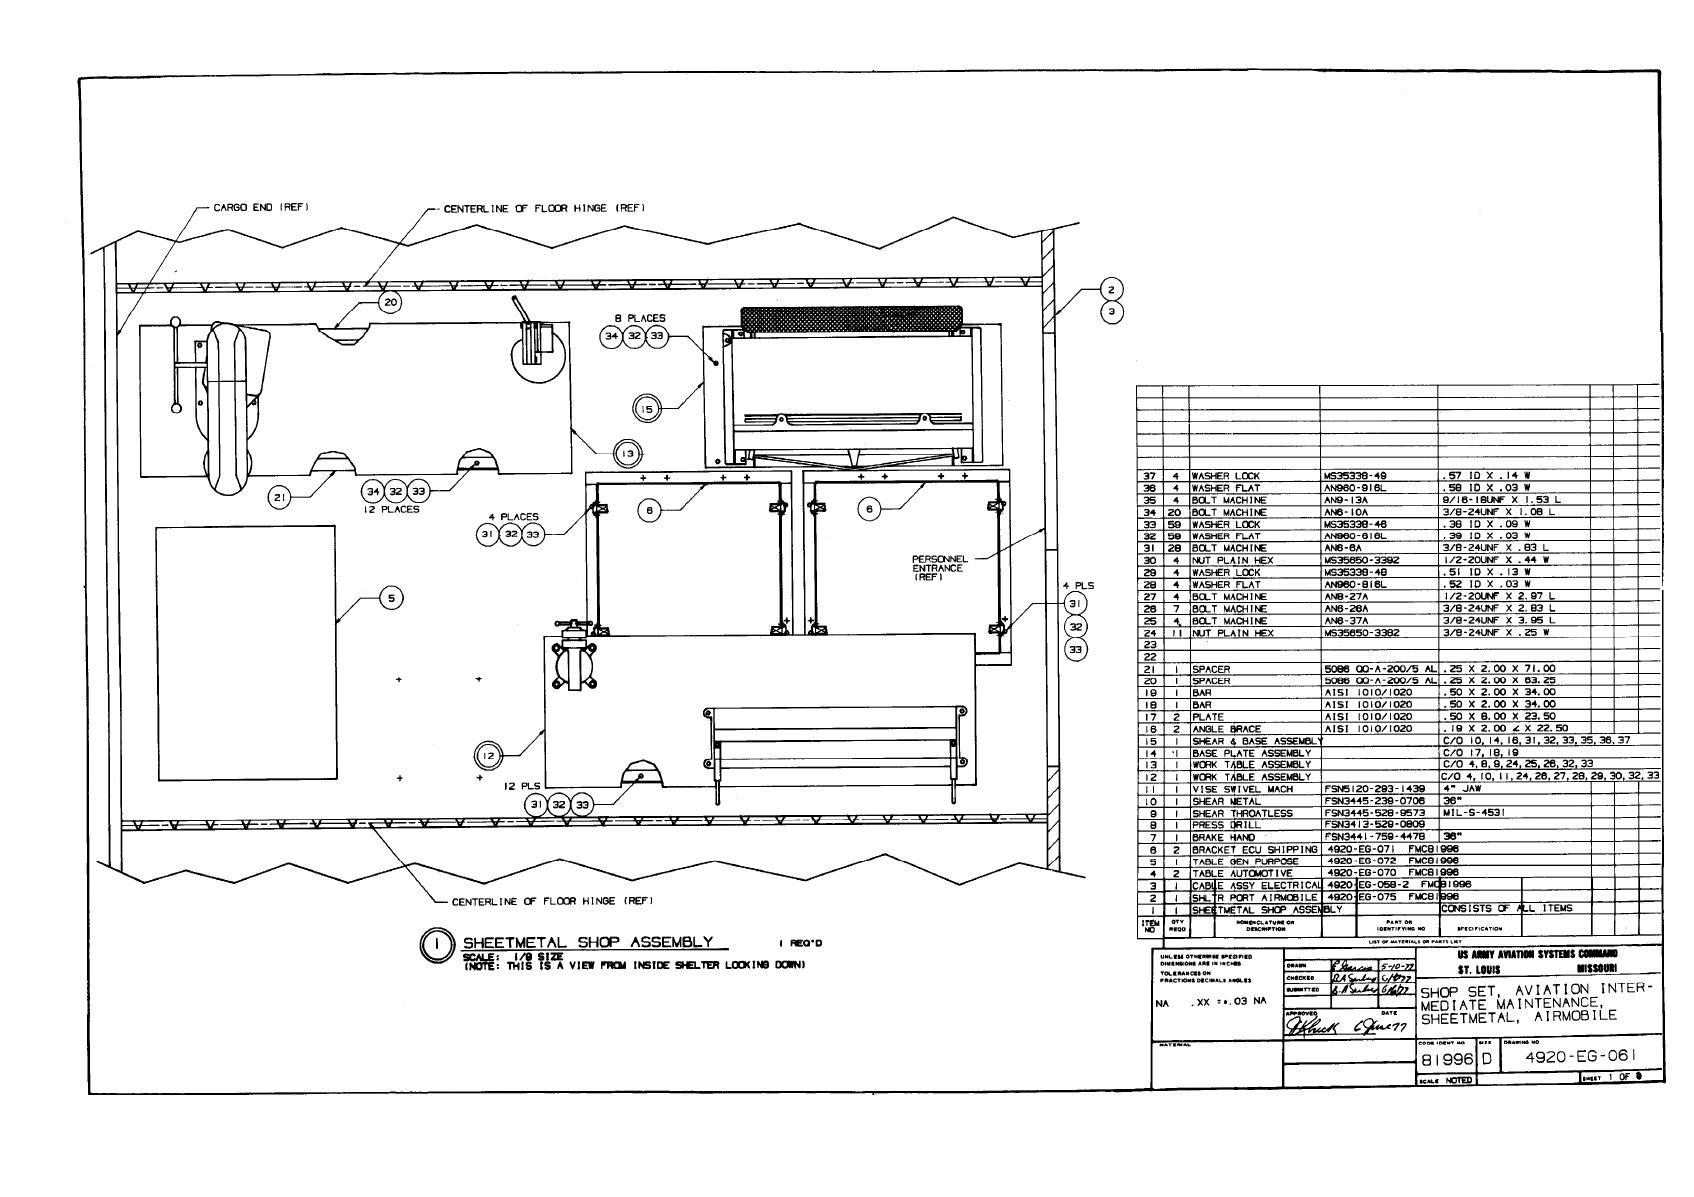 Figure D 4 Shop Set Avim Sheet Metal Airmobile Sheet 1 Of 4